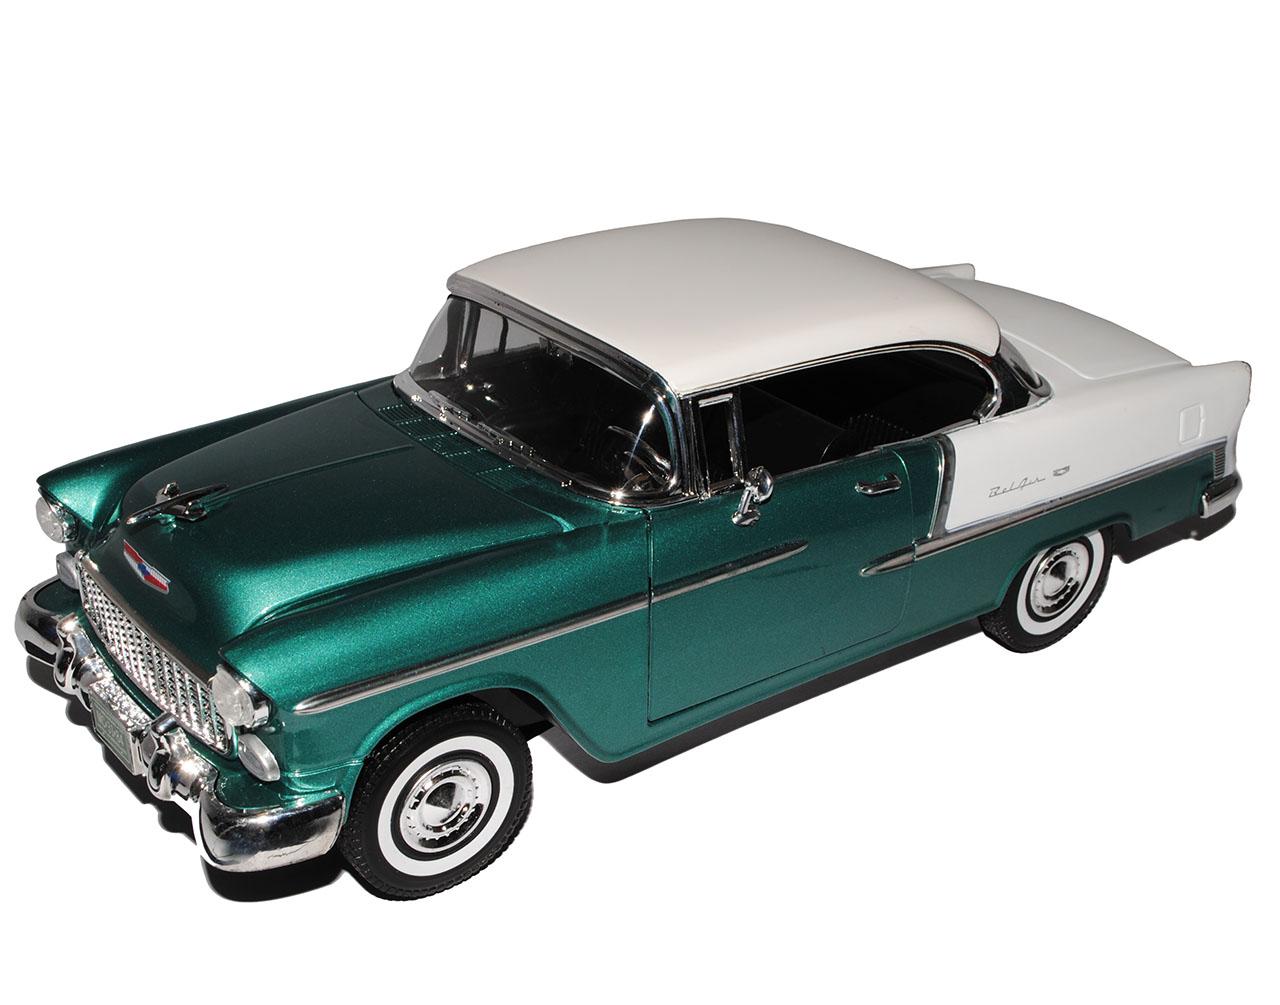 Chevrolet Bel Air Coupe verde con techo blanco 1955 1//18 Motormax modelo coche con...